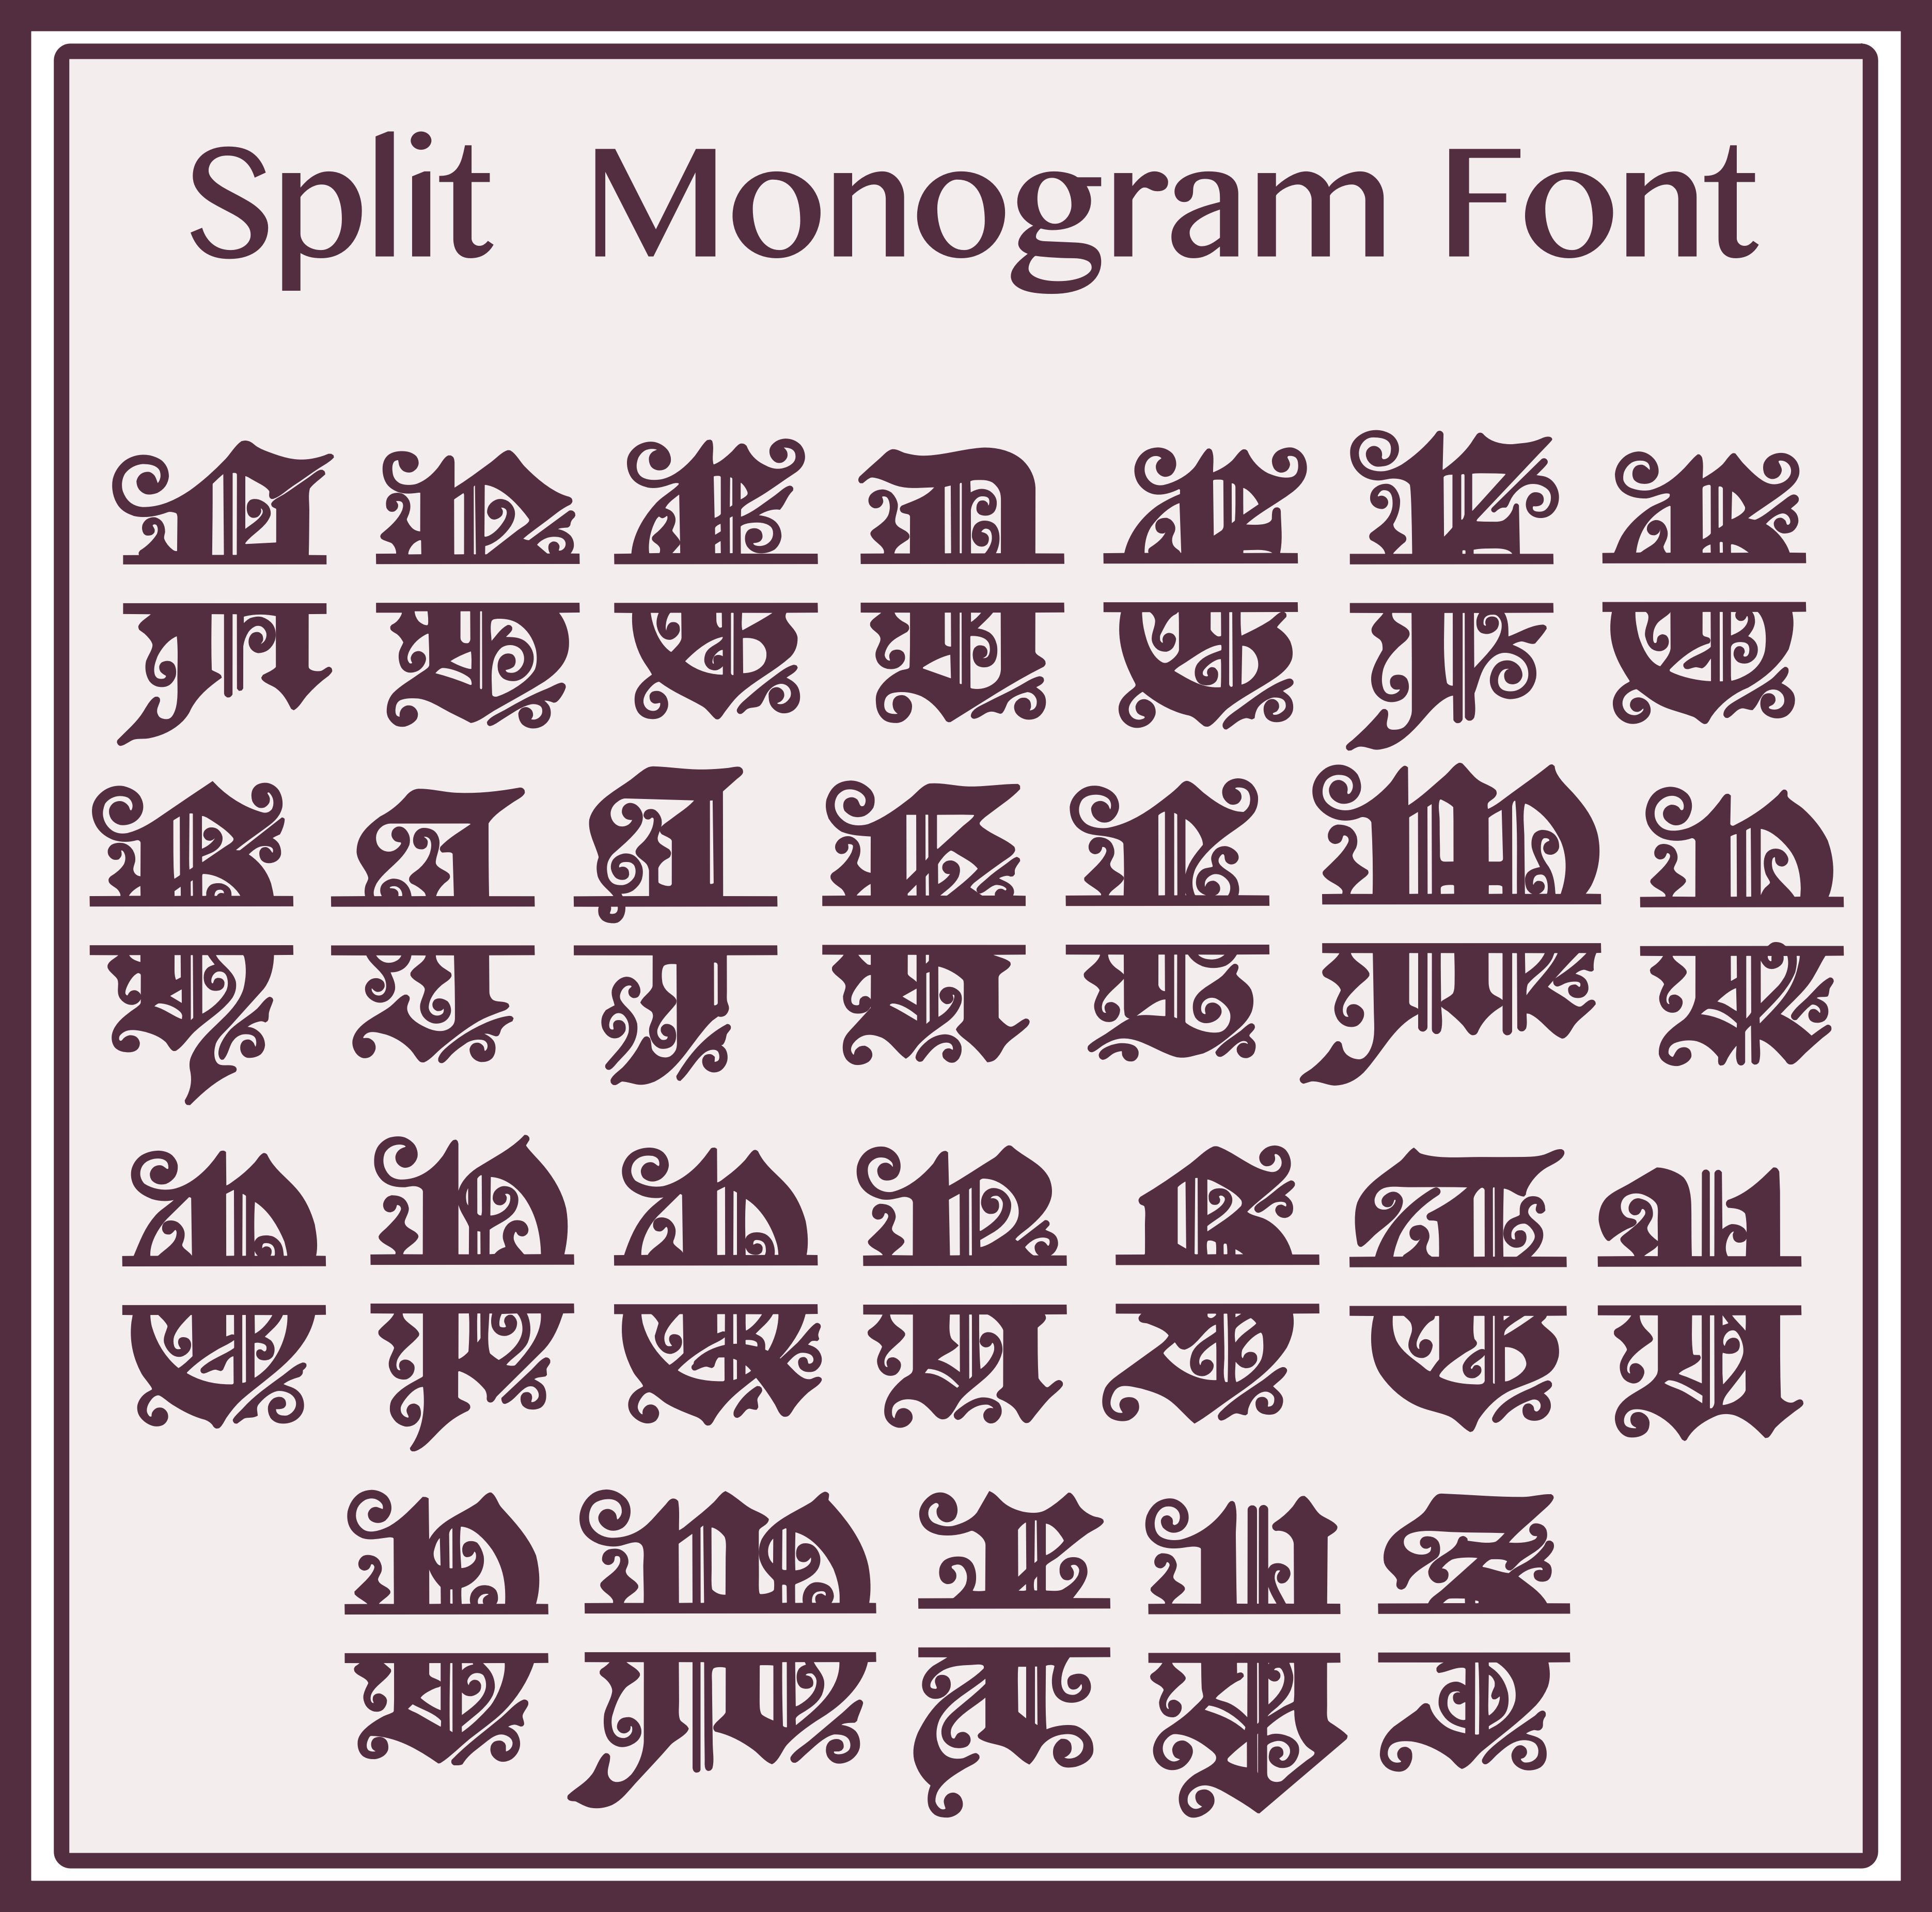 split-monogram